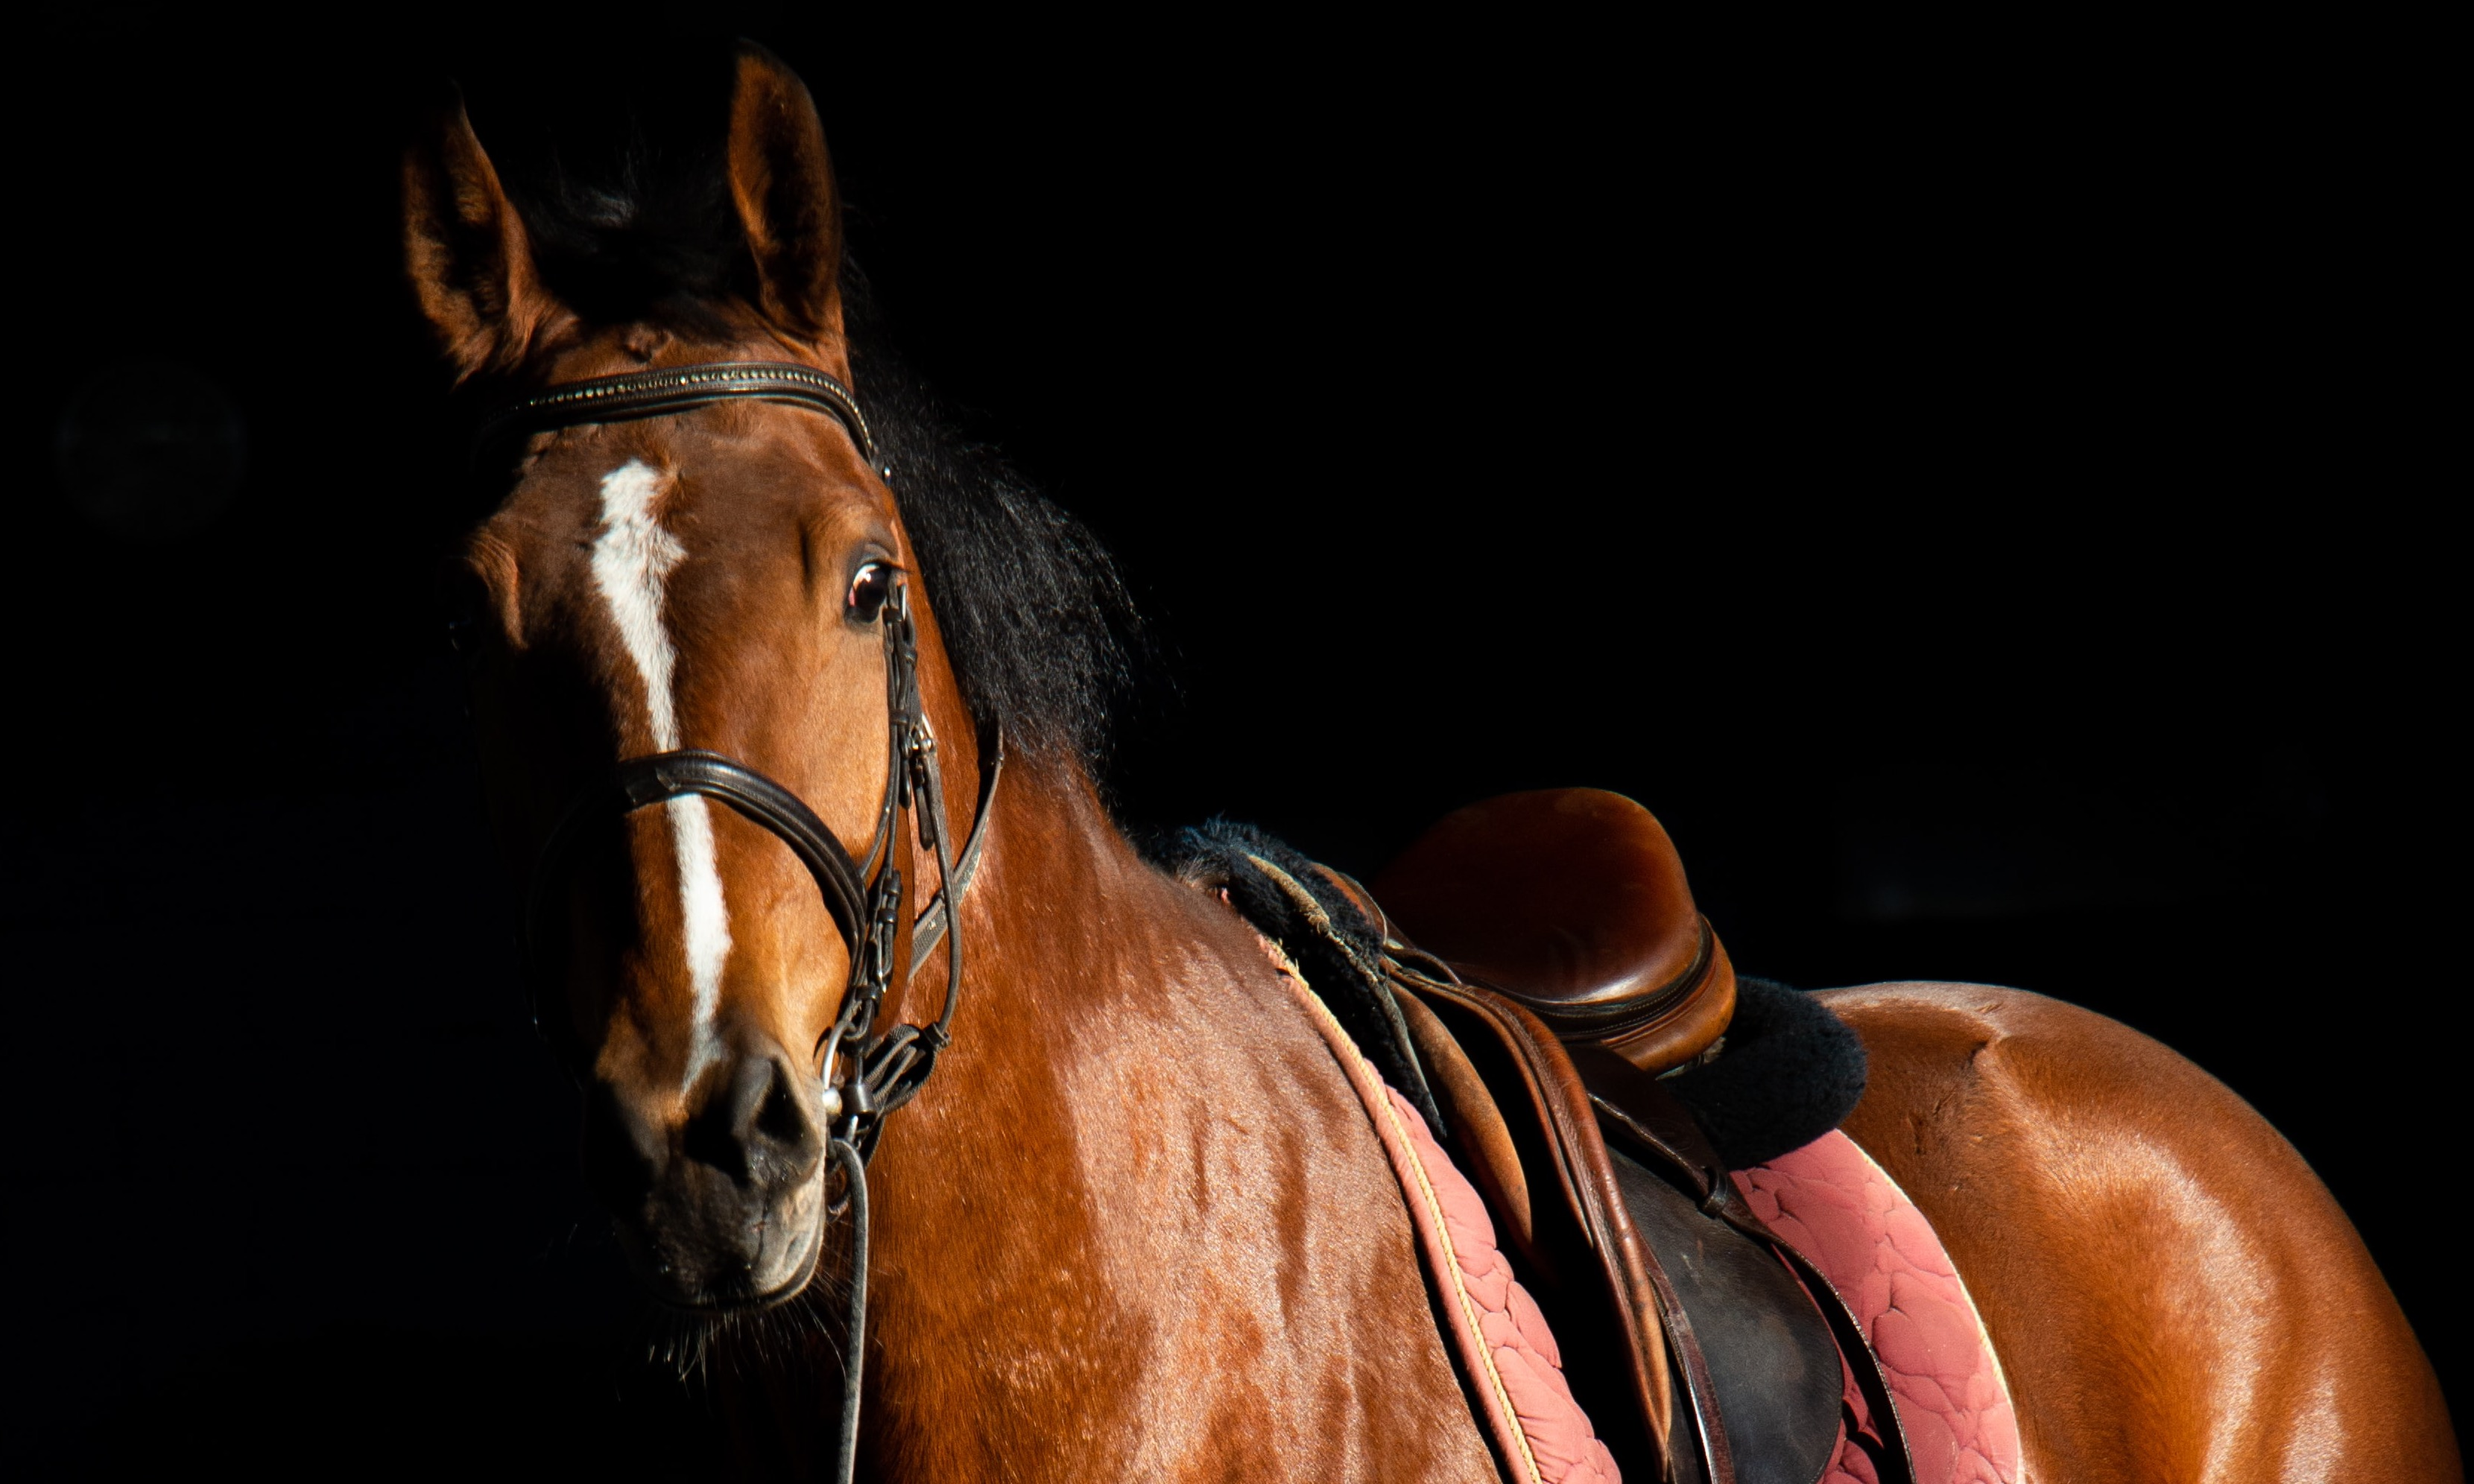 Sprechende Pferde flunkern oft | story.one